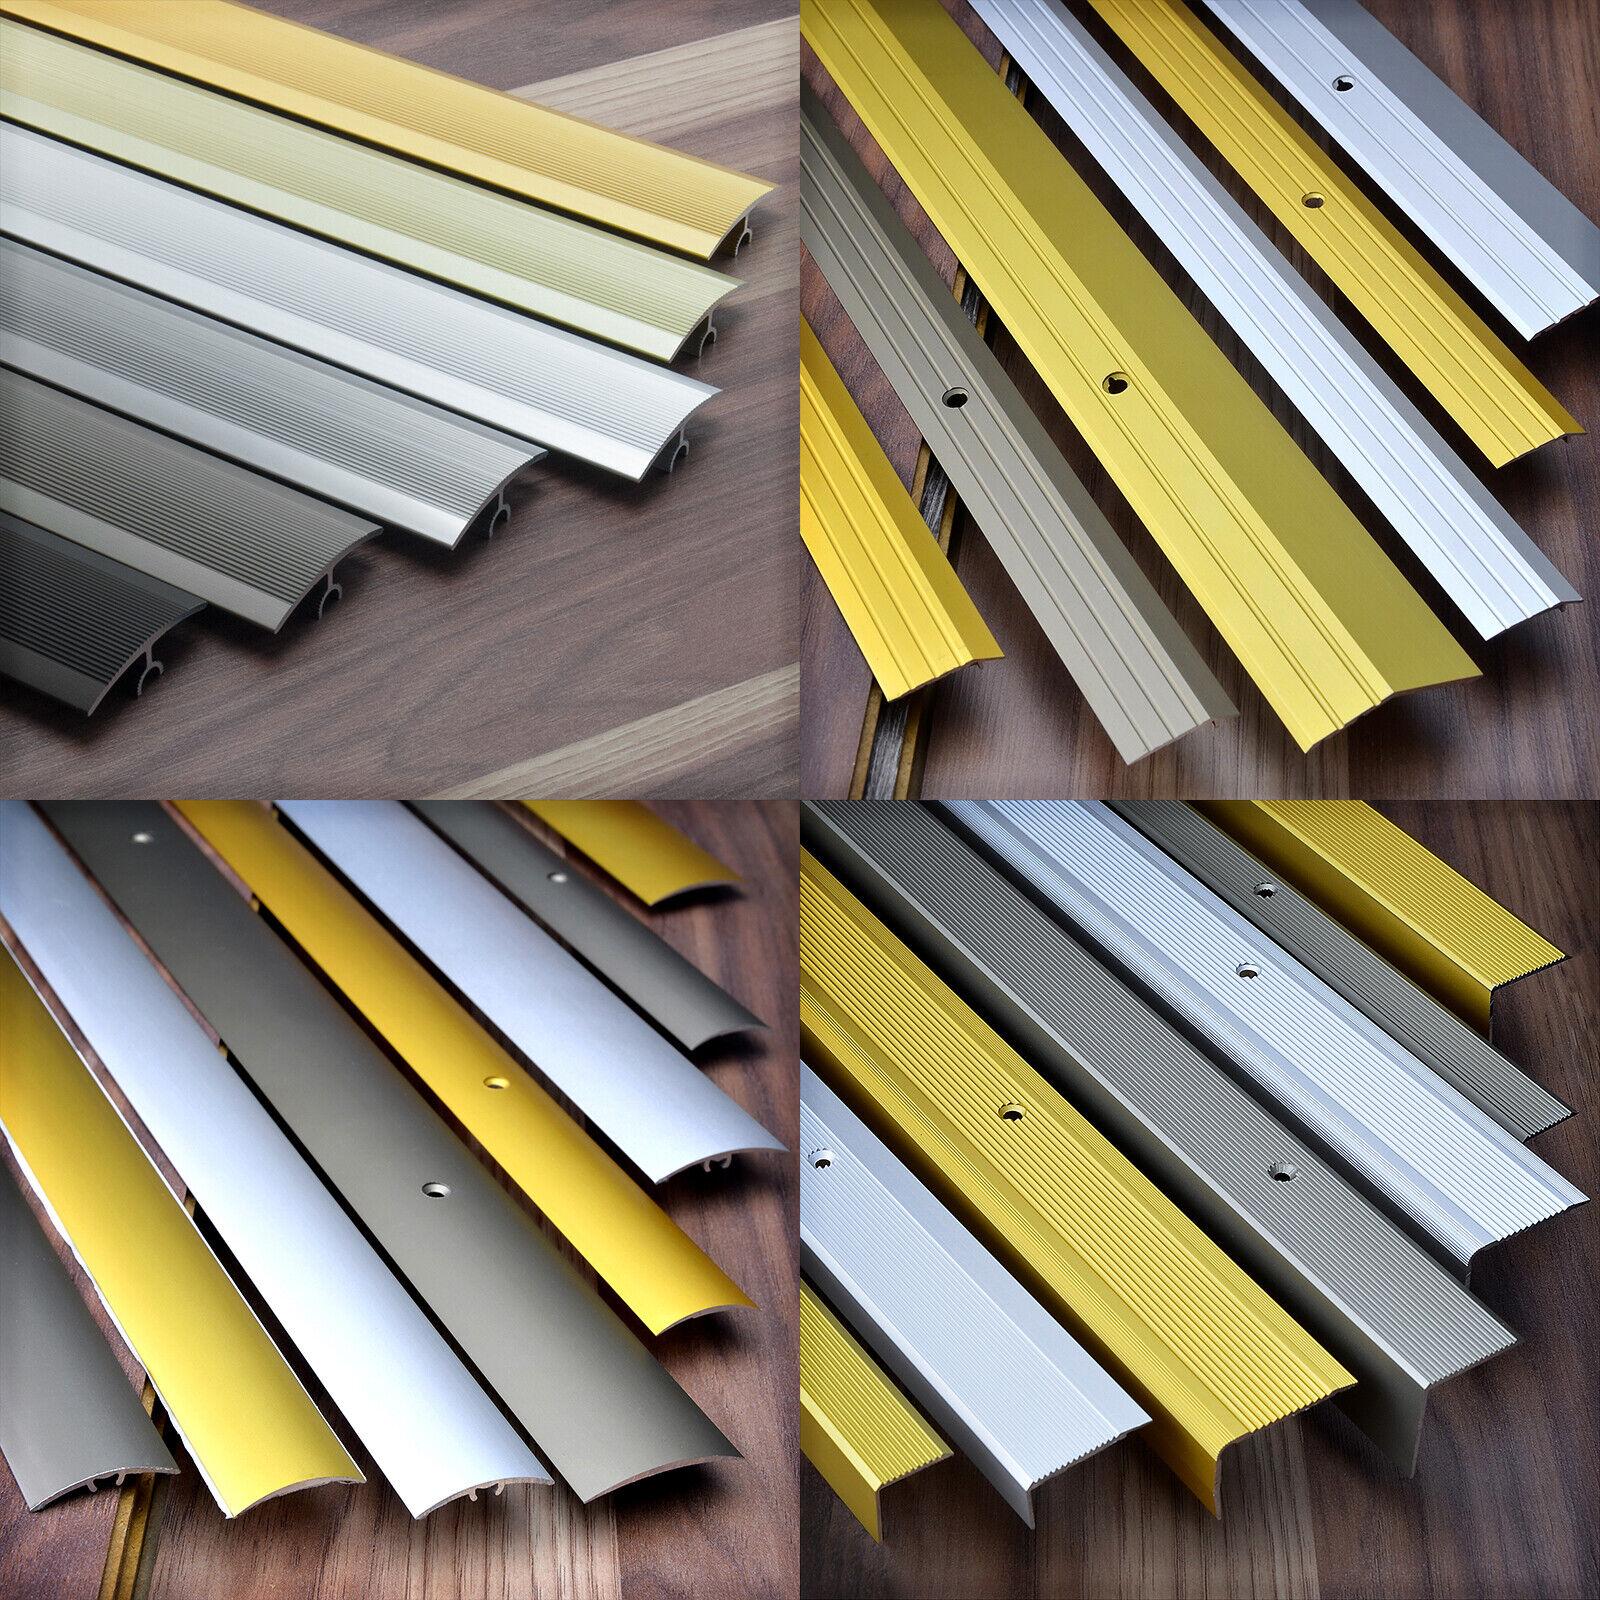 Alu Profil Abschlussprofile Übergangsprofil Winkelprofil Parkett Treppenprofil